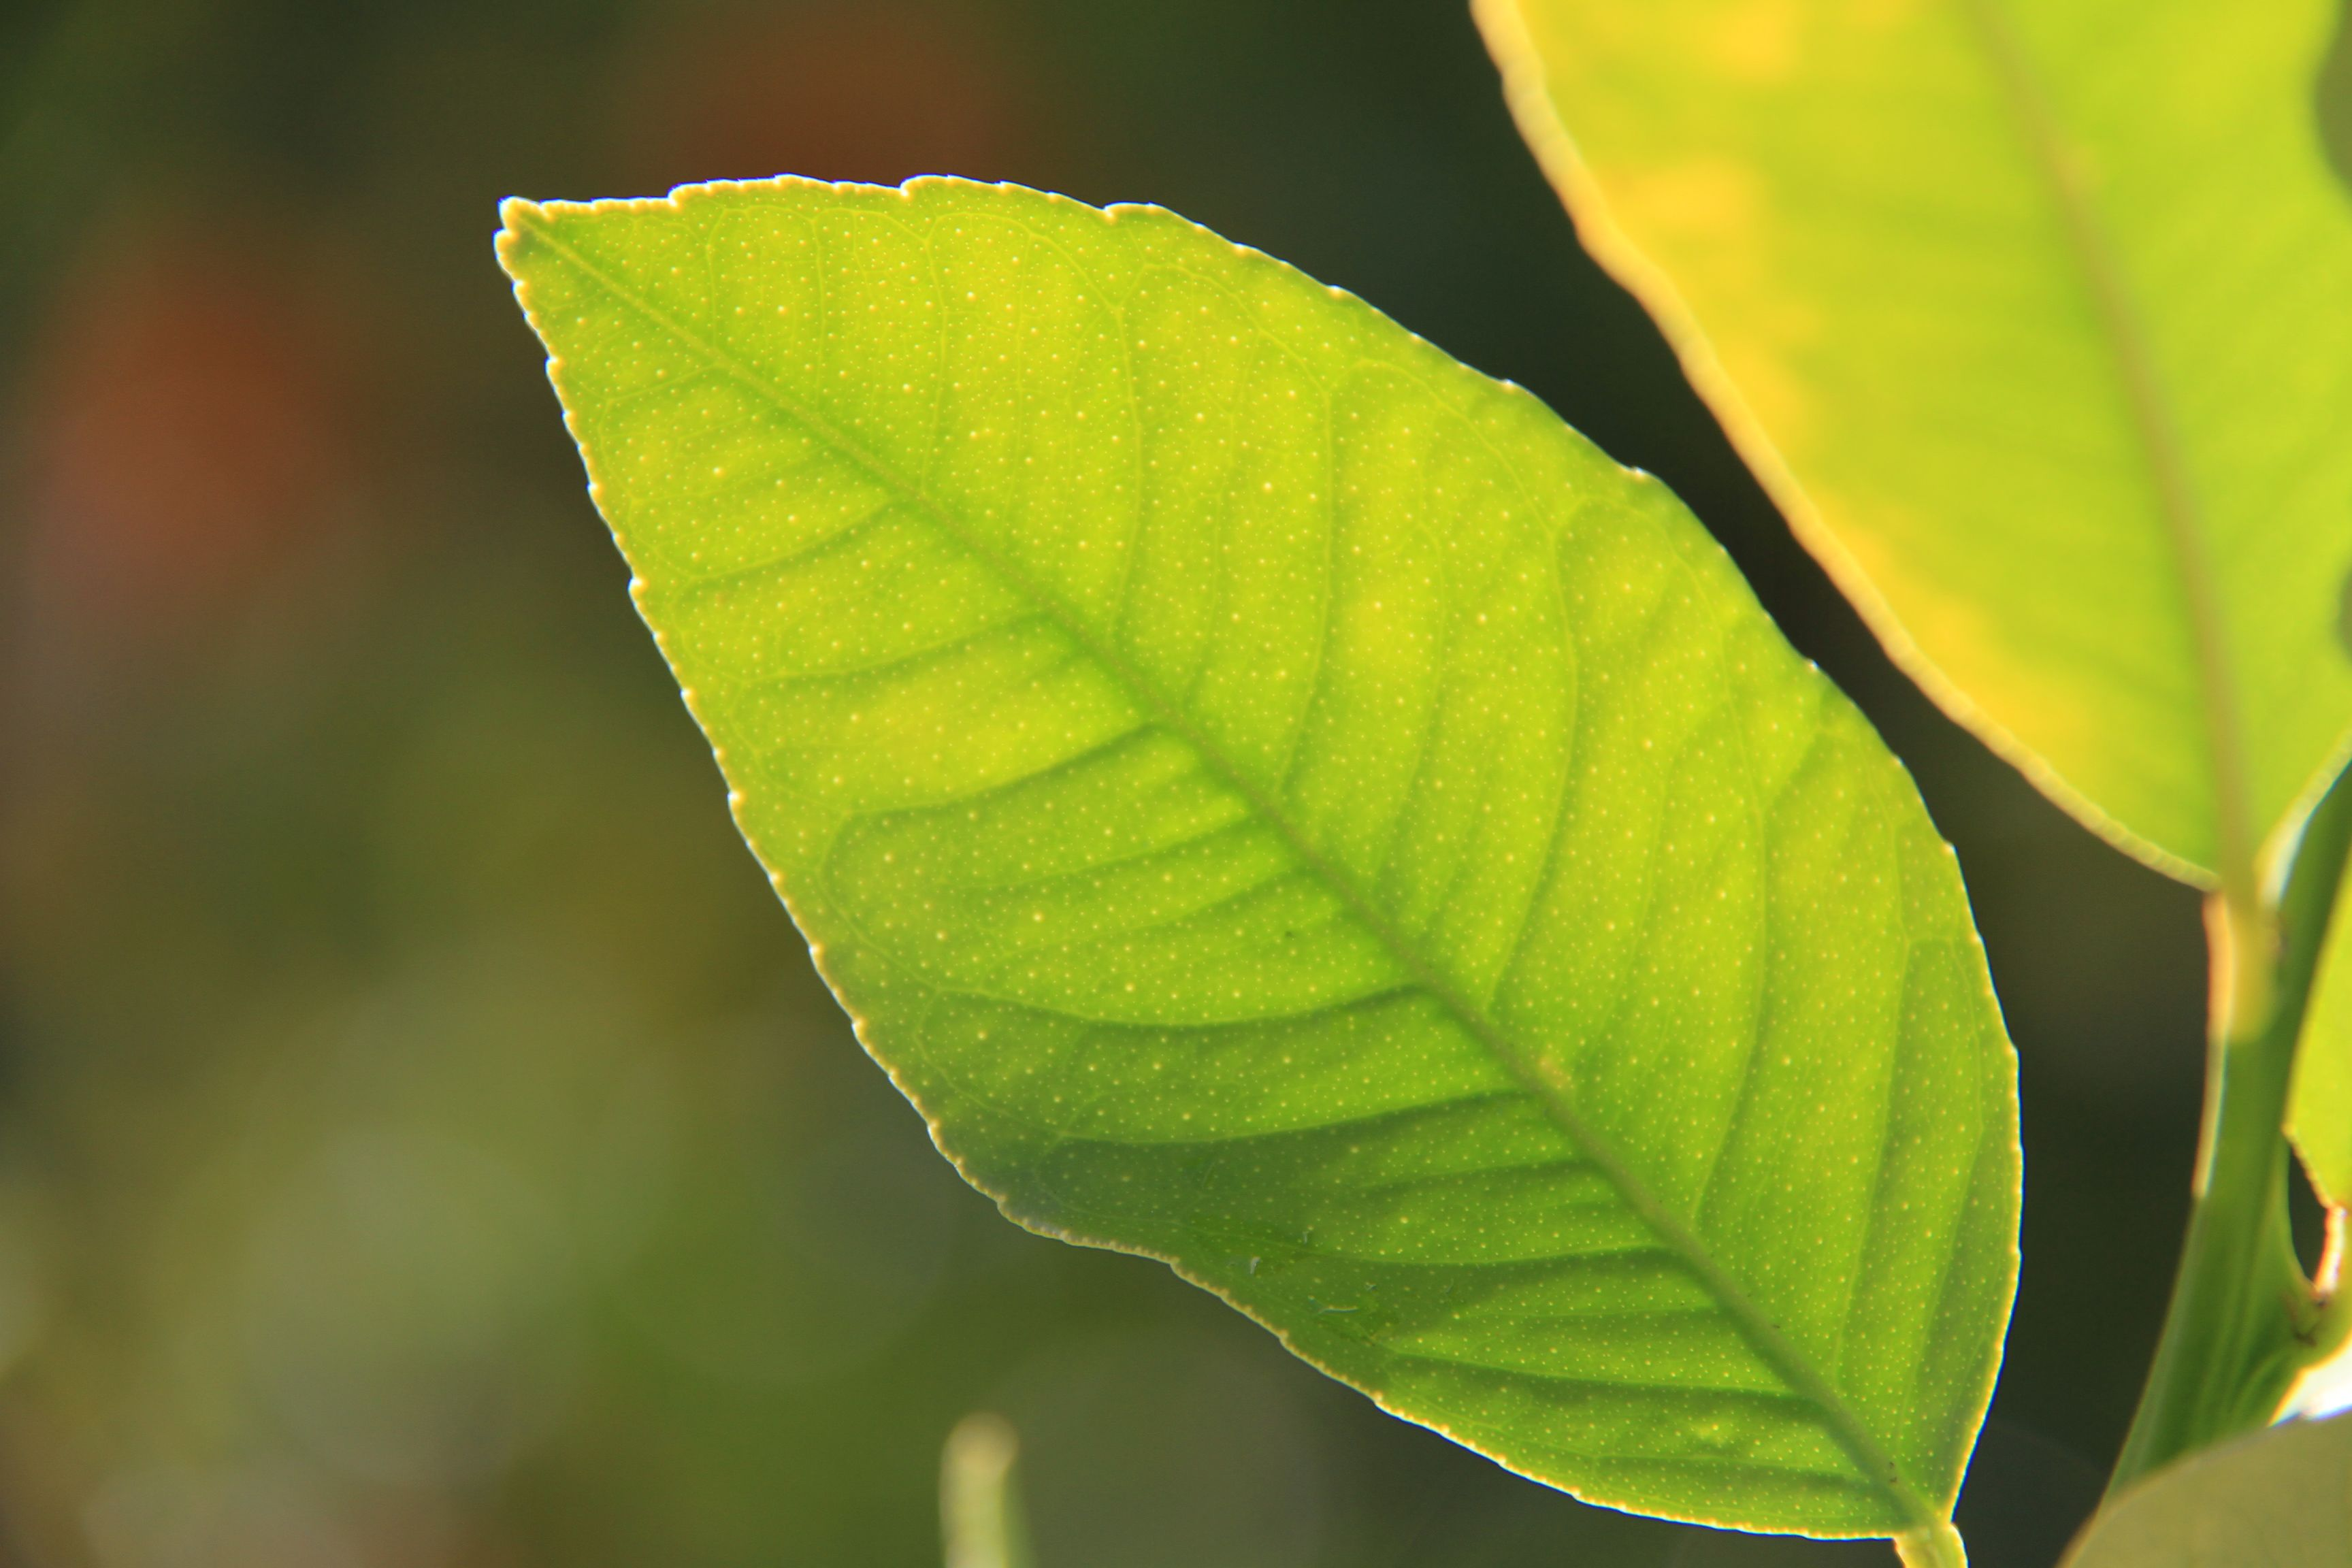 Green leaves of lemon tree in my backyard